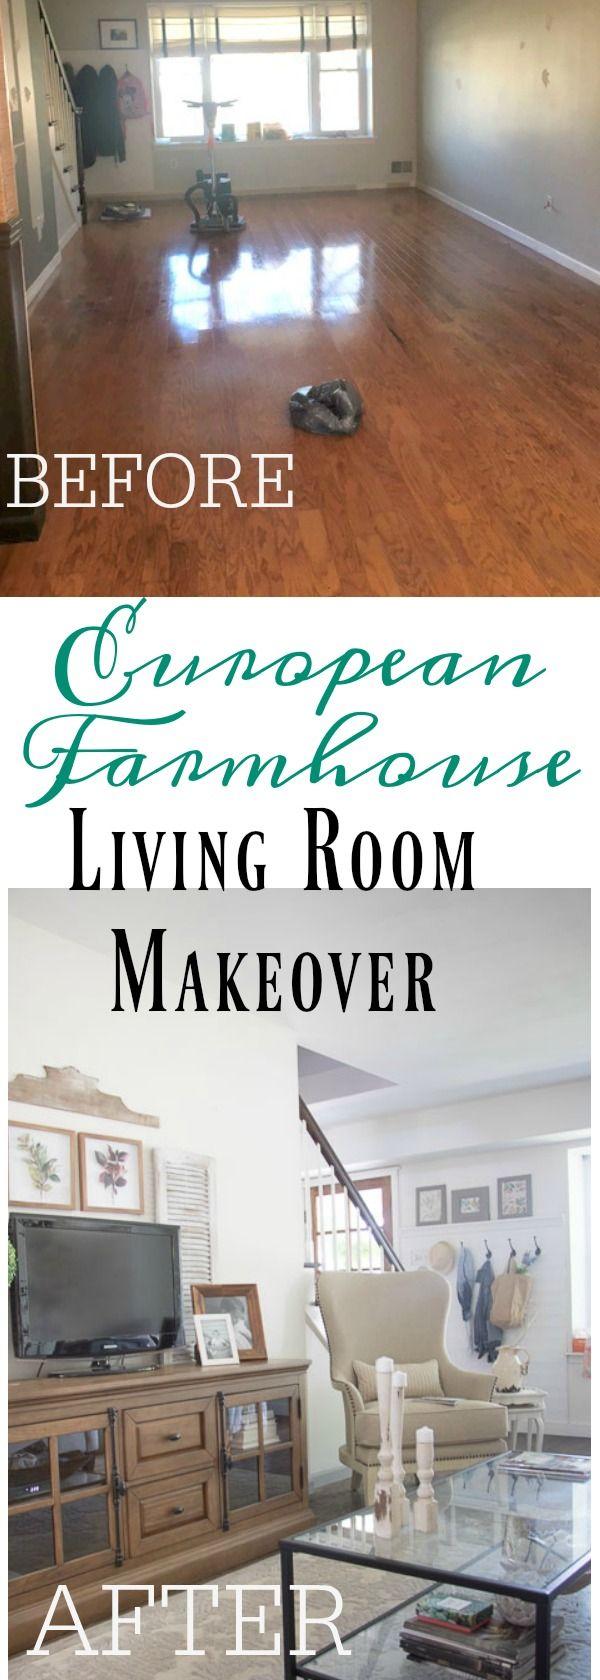 Farmhouse Furniture: European Farmhouse Living Room Makeover